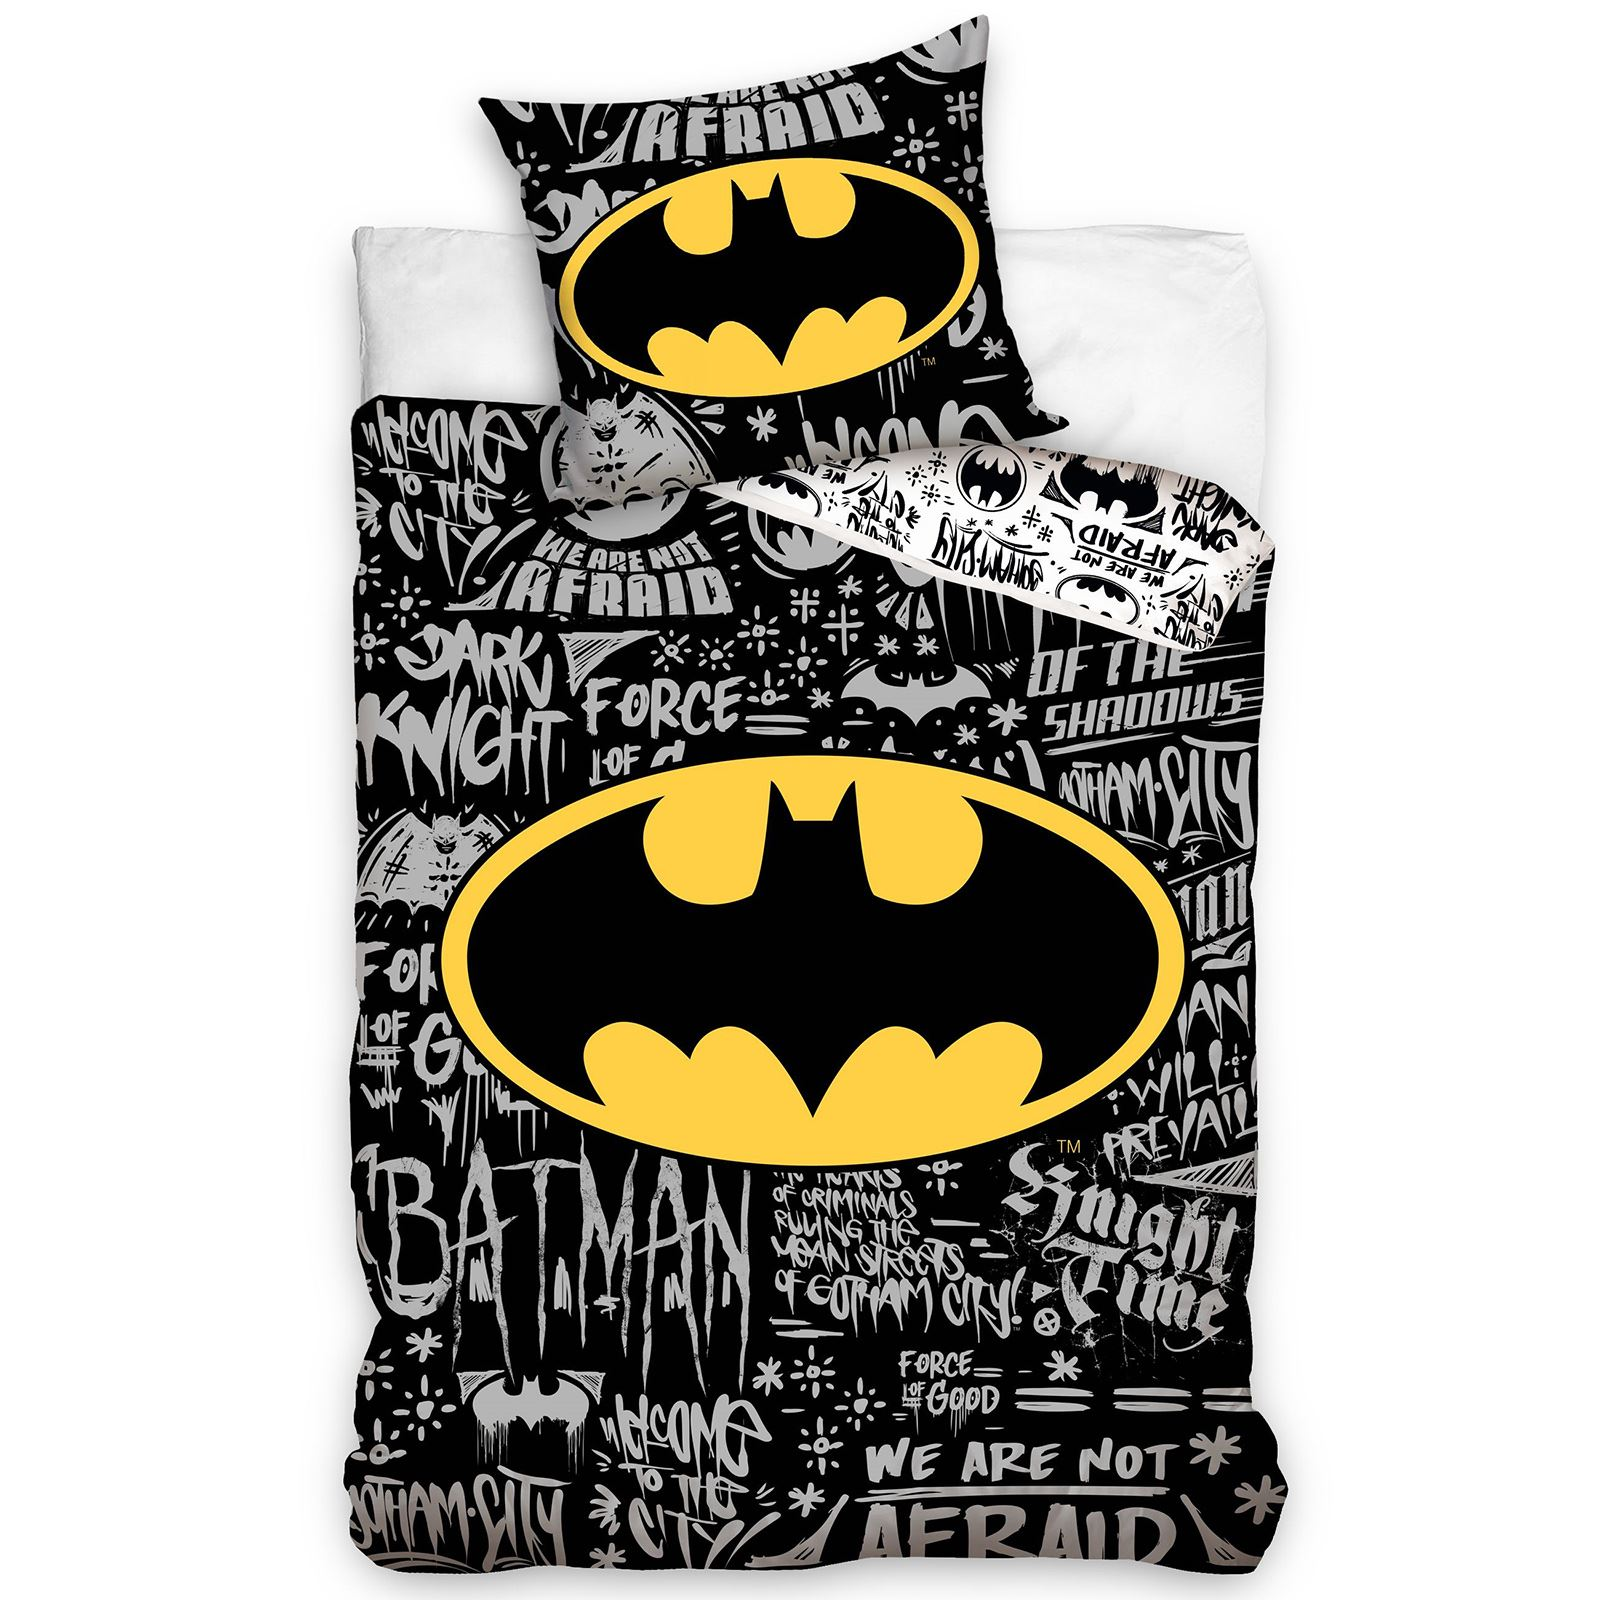 Dc Comics Batman Amp Superman Duvet Cover And Pillowcase